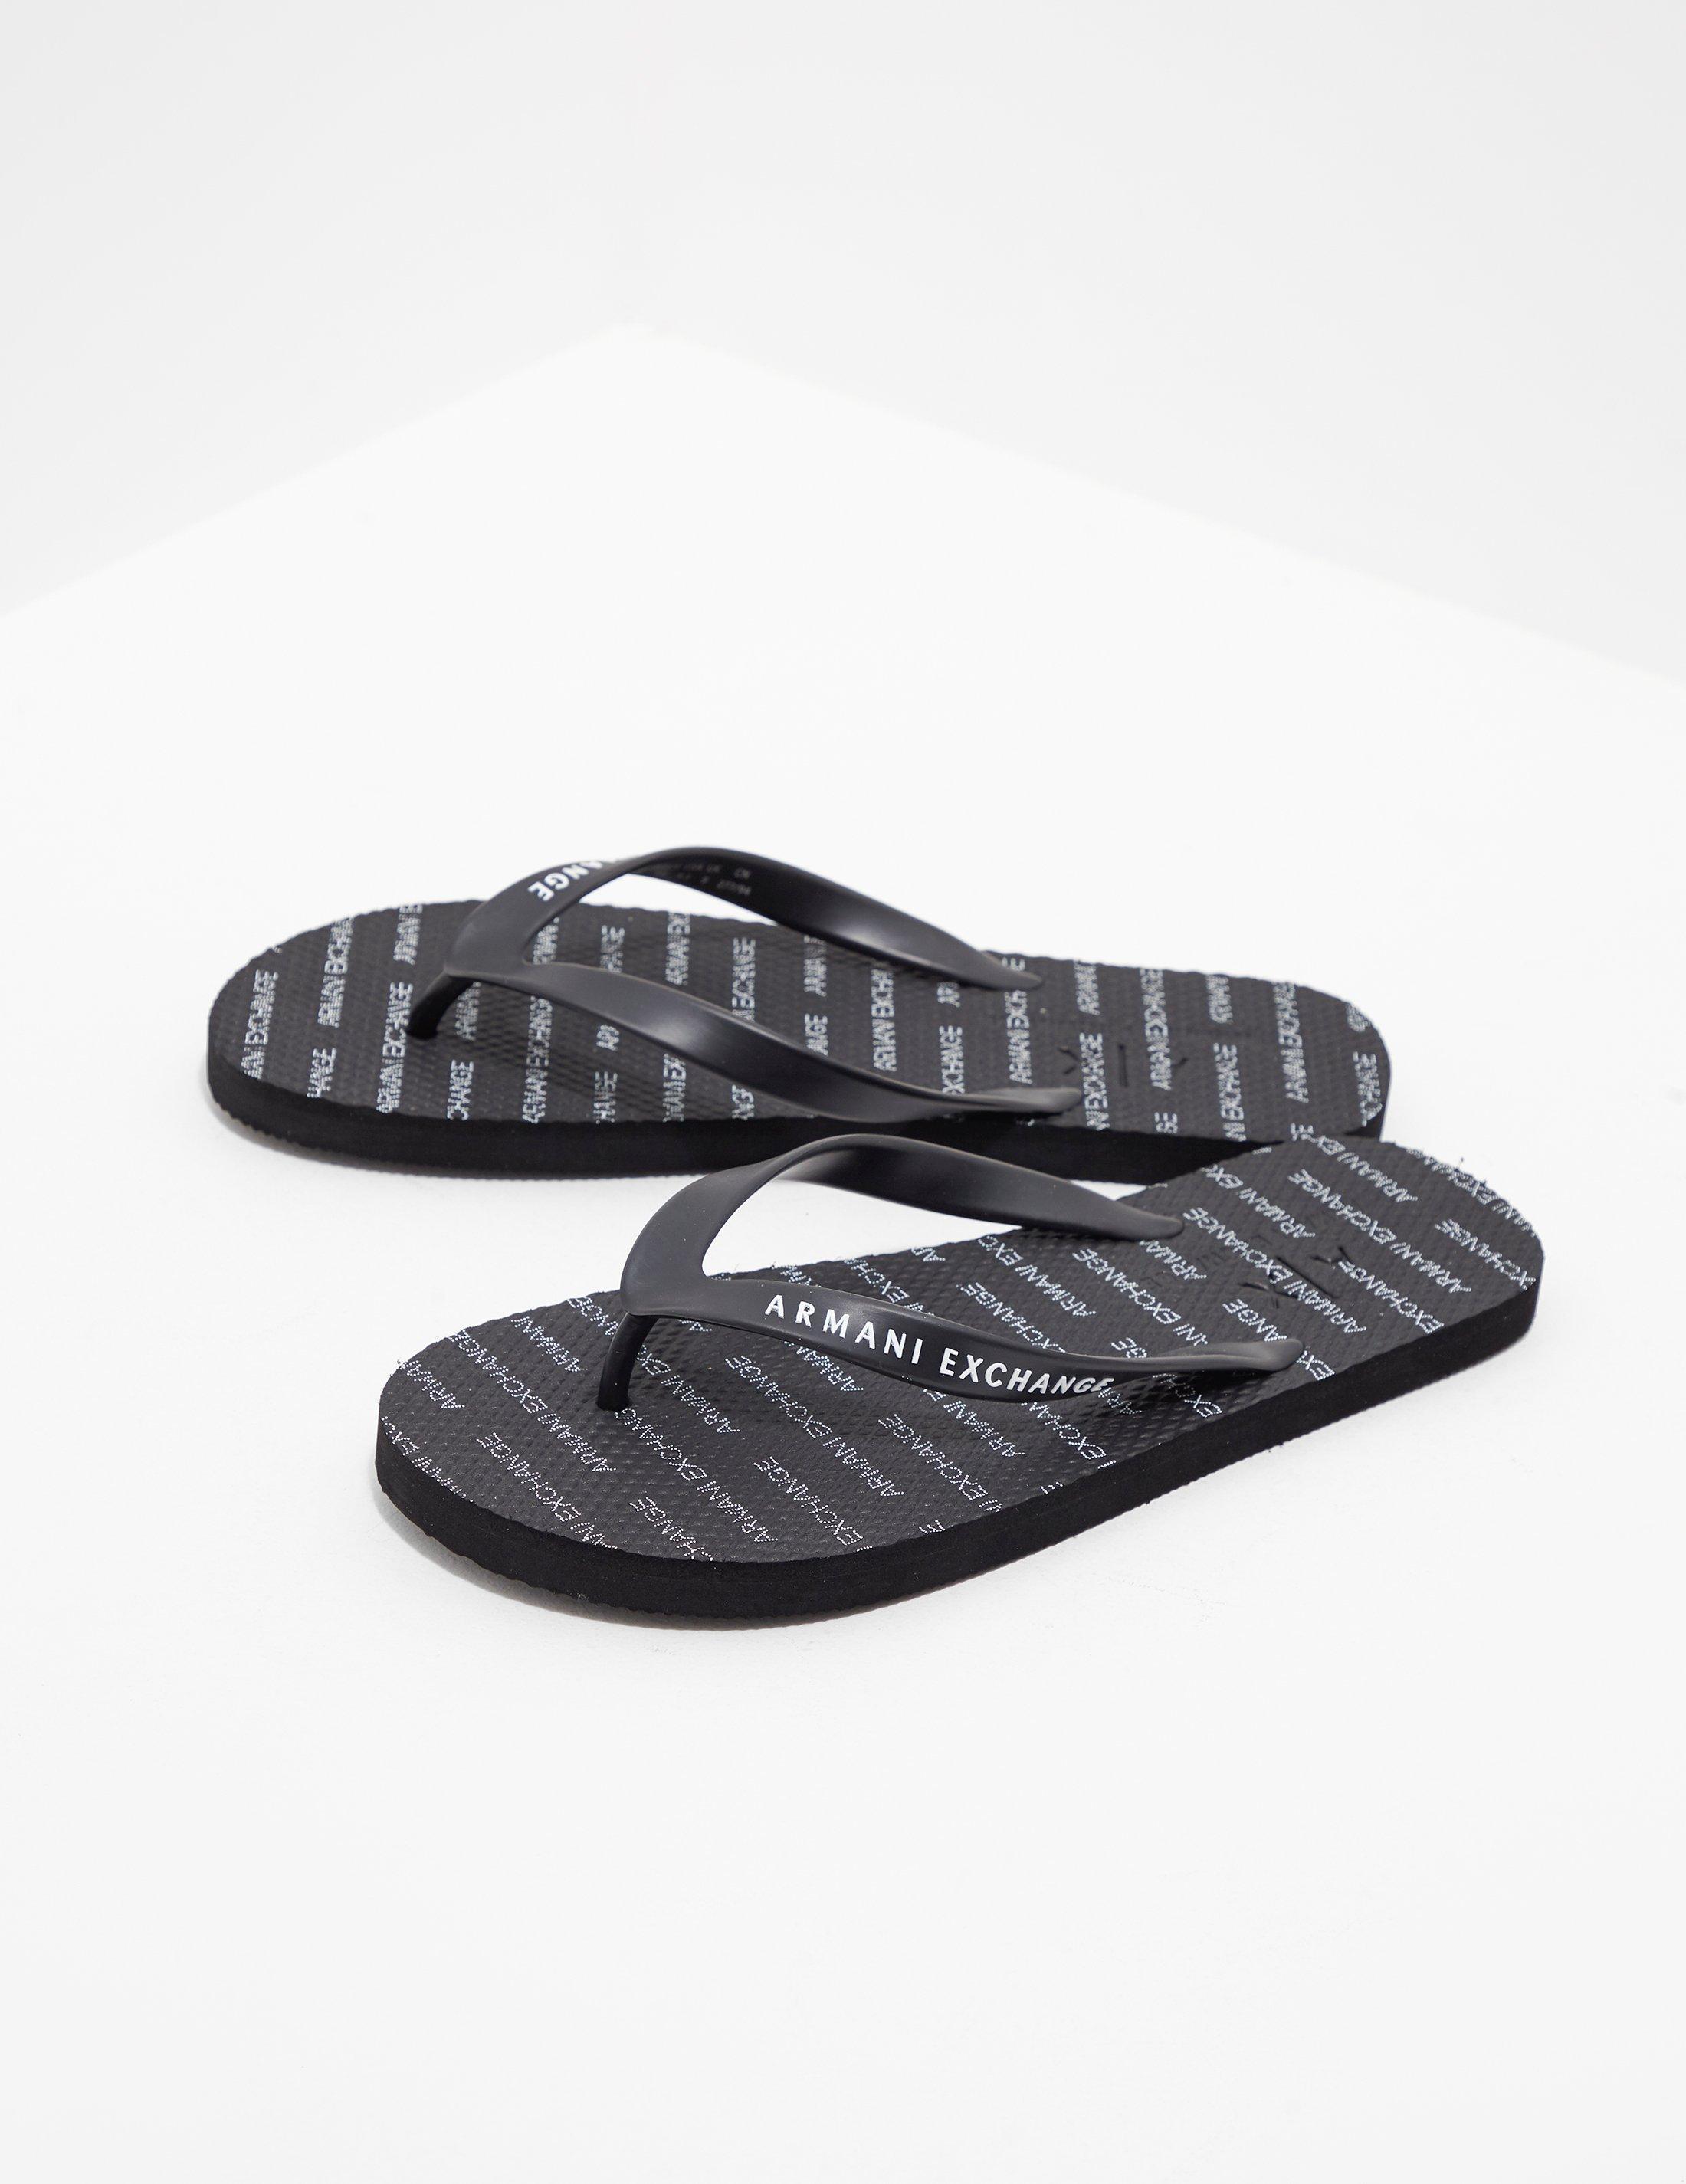 4fab46a63c99 Armani Exchange Beach Flip Flops Black in Black for Men - Lyst